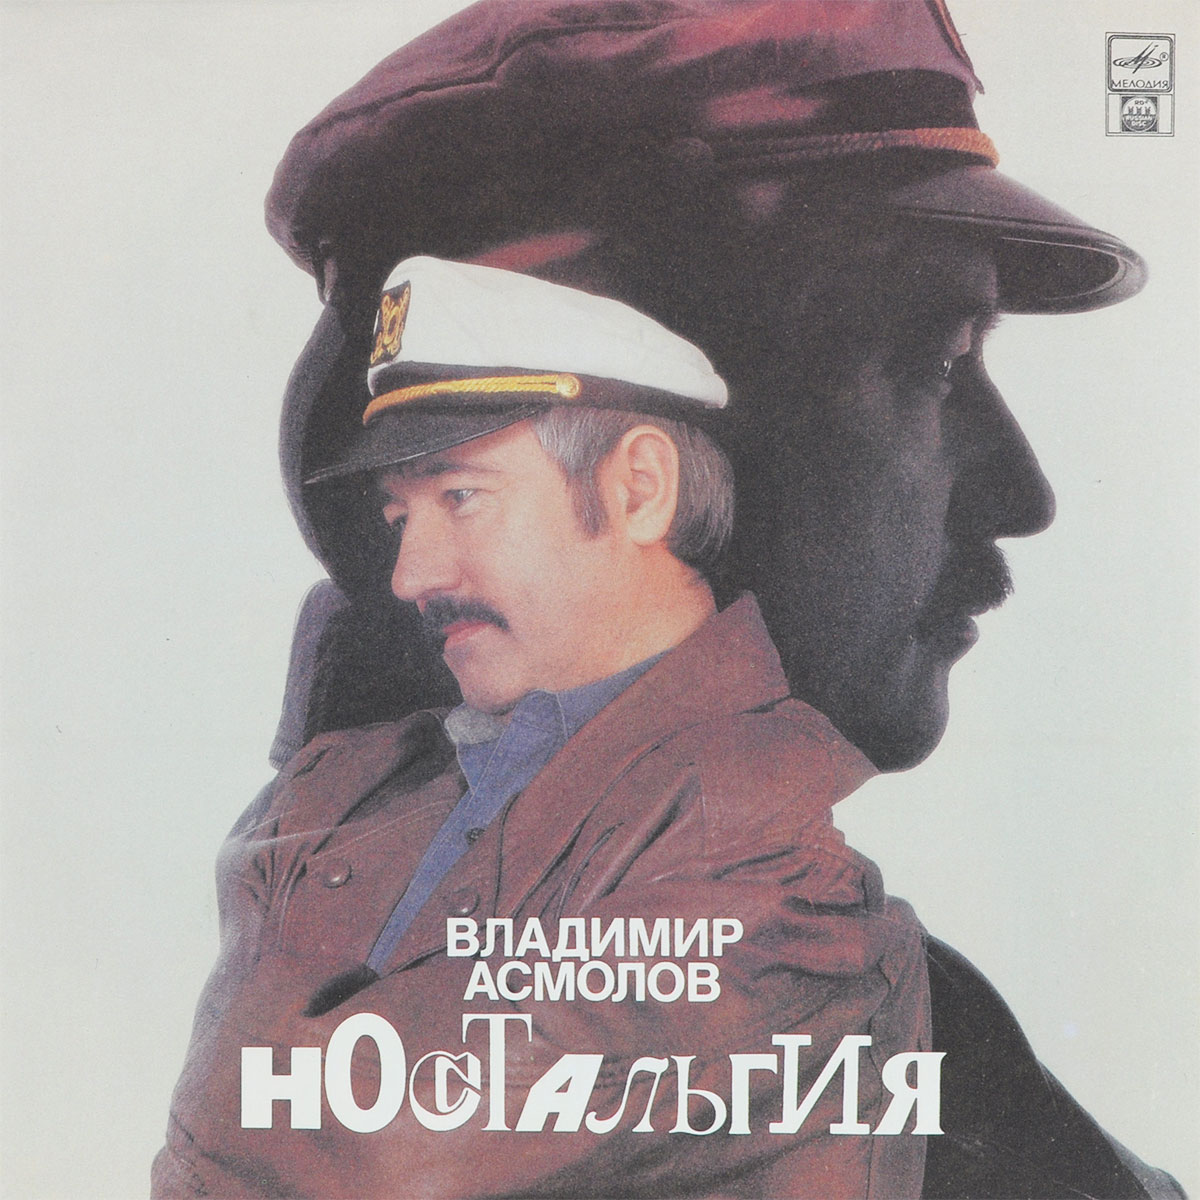 LP 1:Tracks 1 - 5LP 2:Tracks 6 - 10